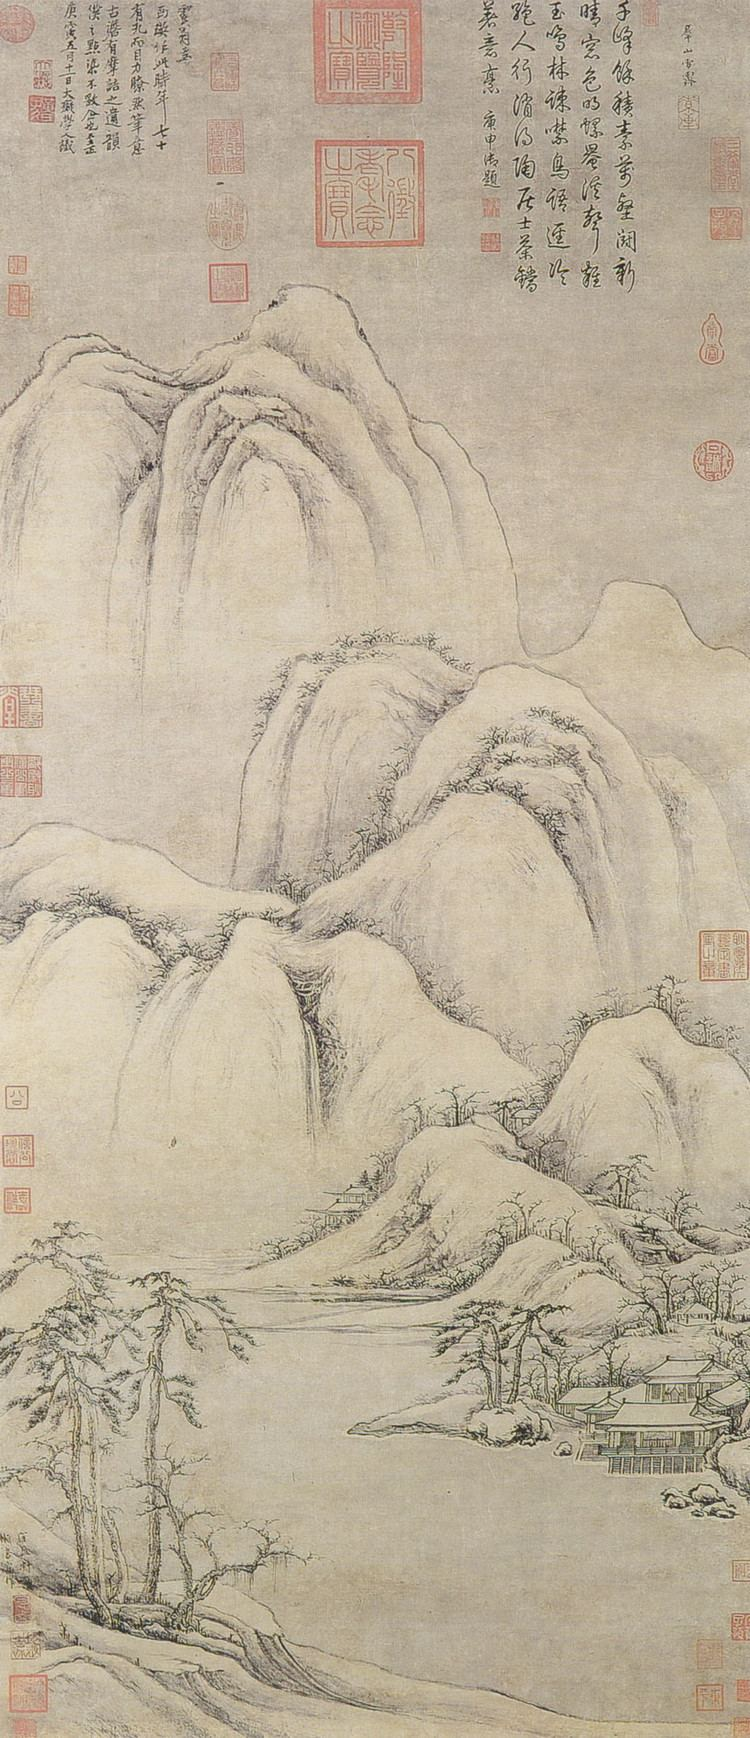 Cao Zhibai Cao Zhibai Wikipedia